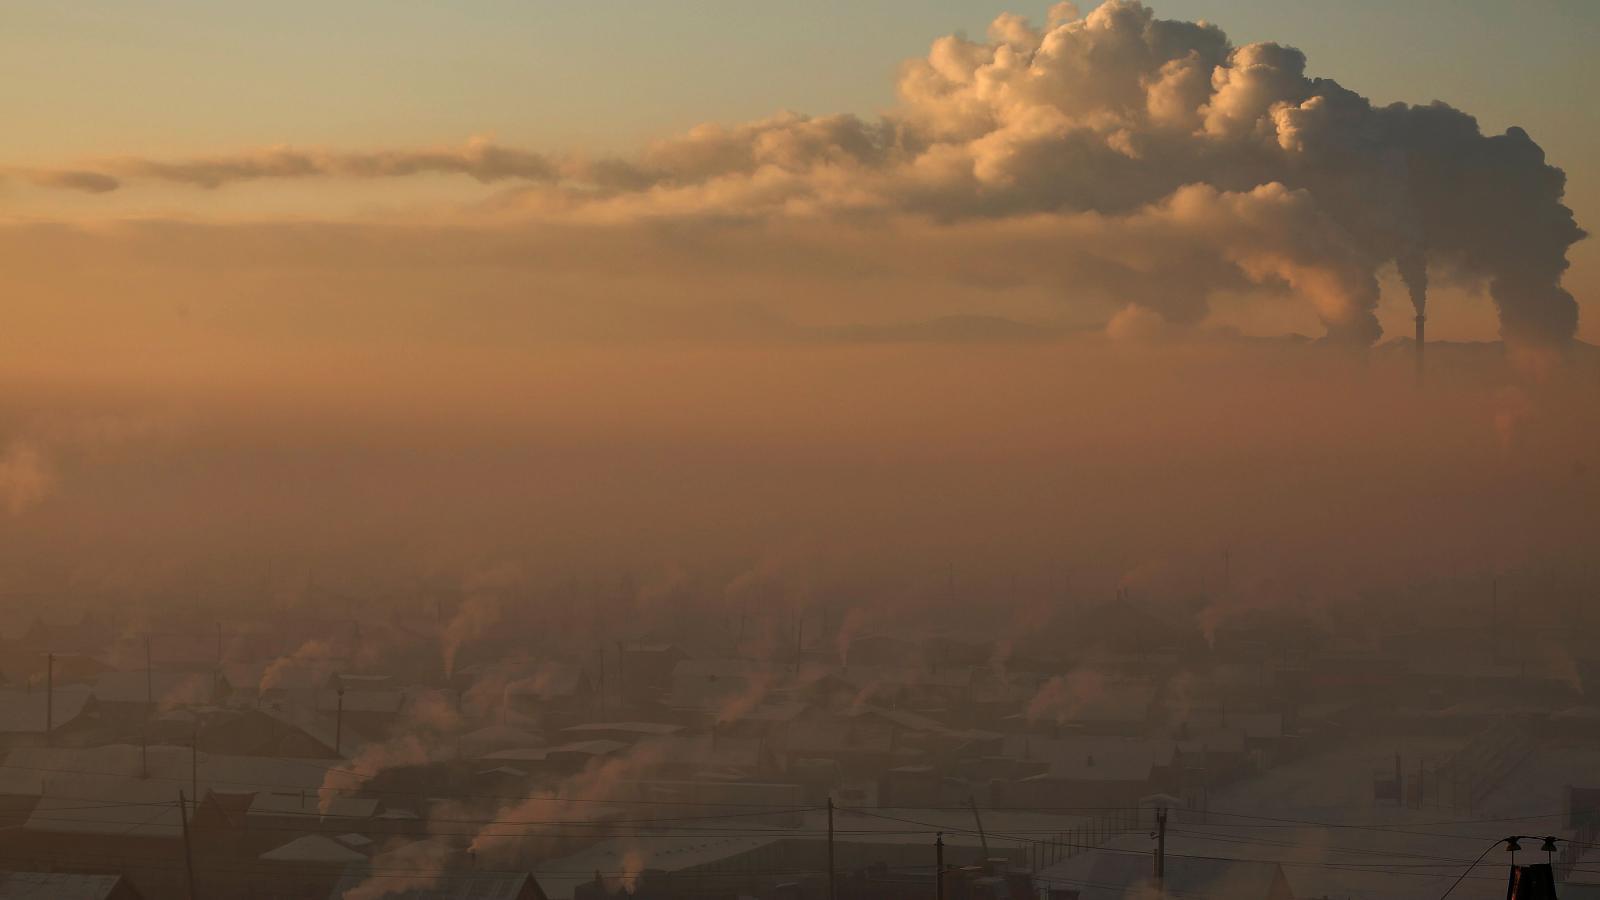 mongolia s air pollution